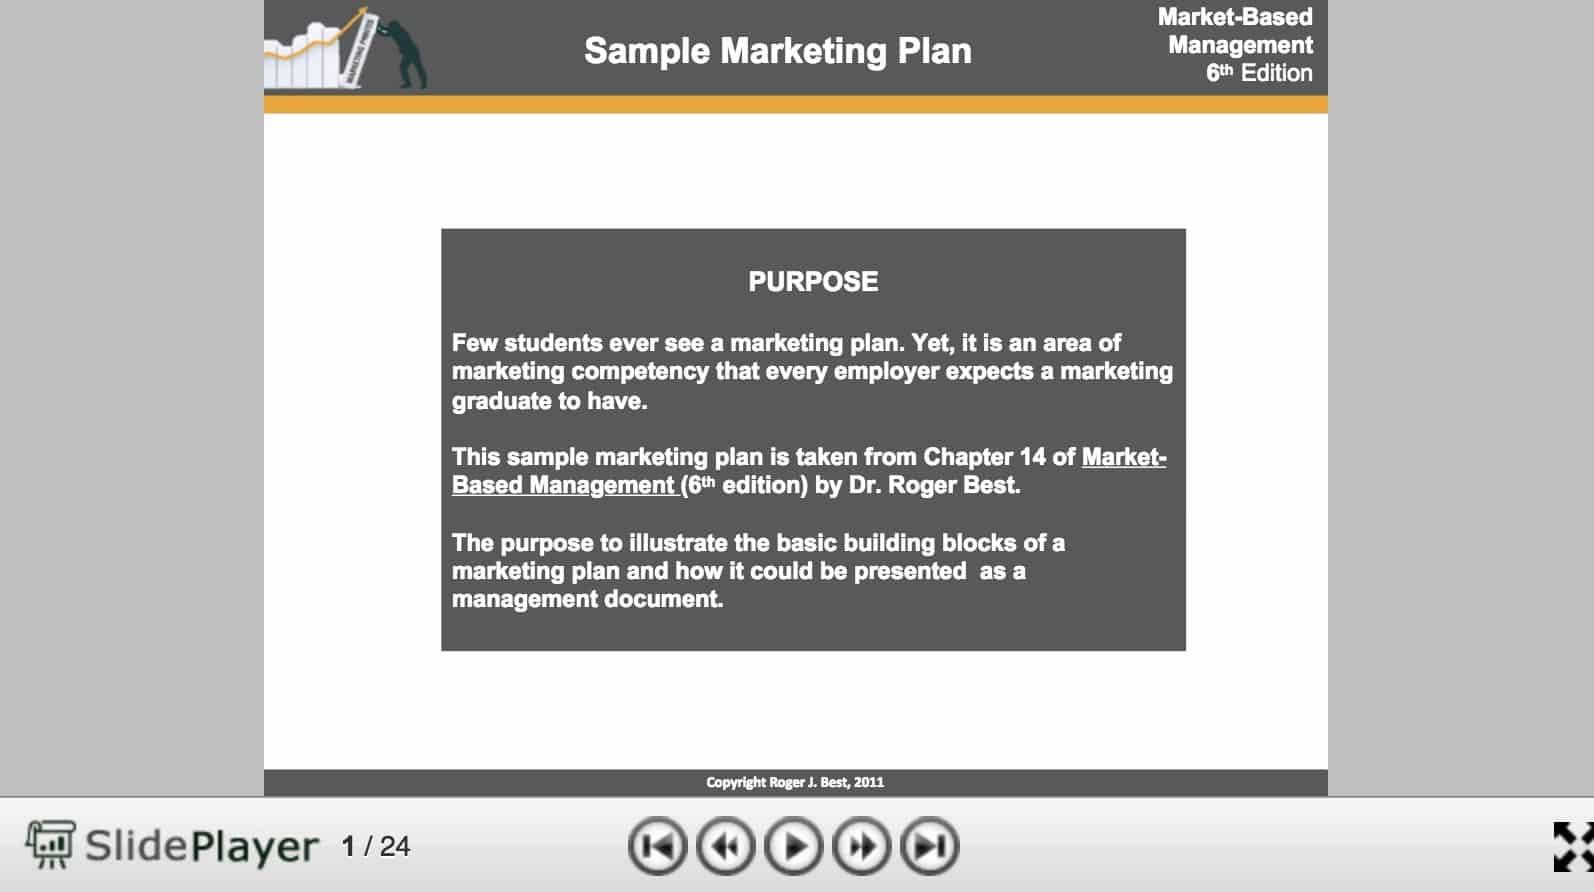 Piktochart-Free-Marketing-Plan-Tool